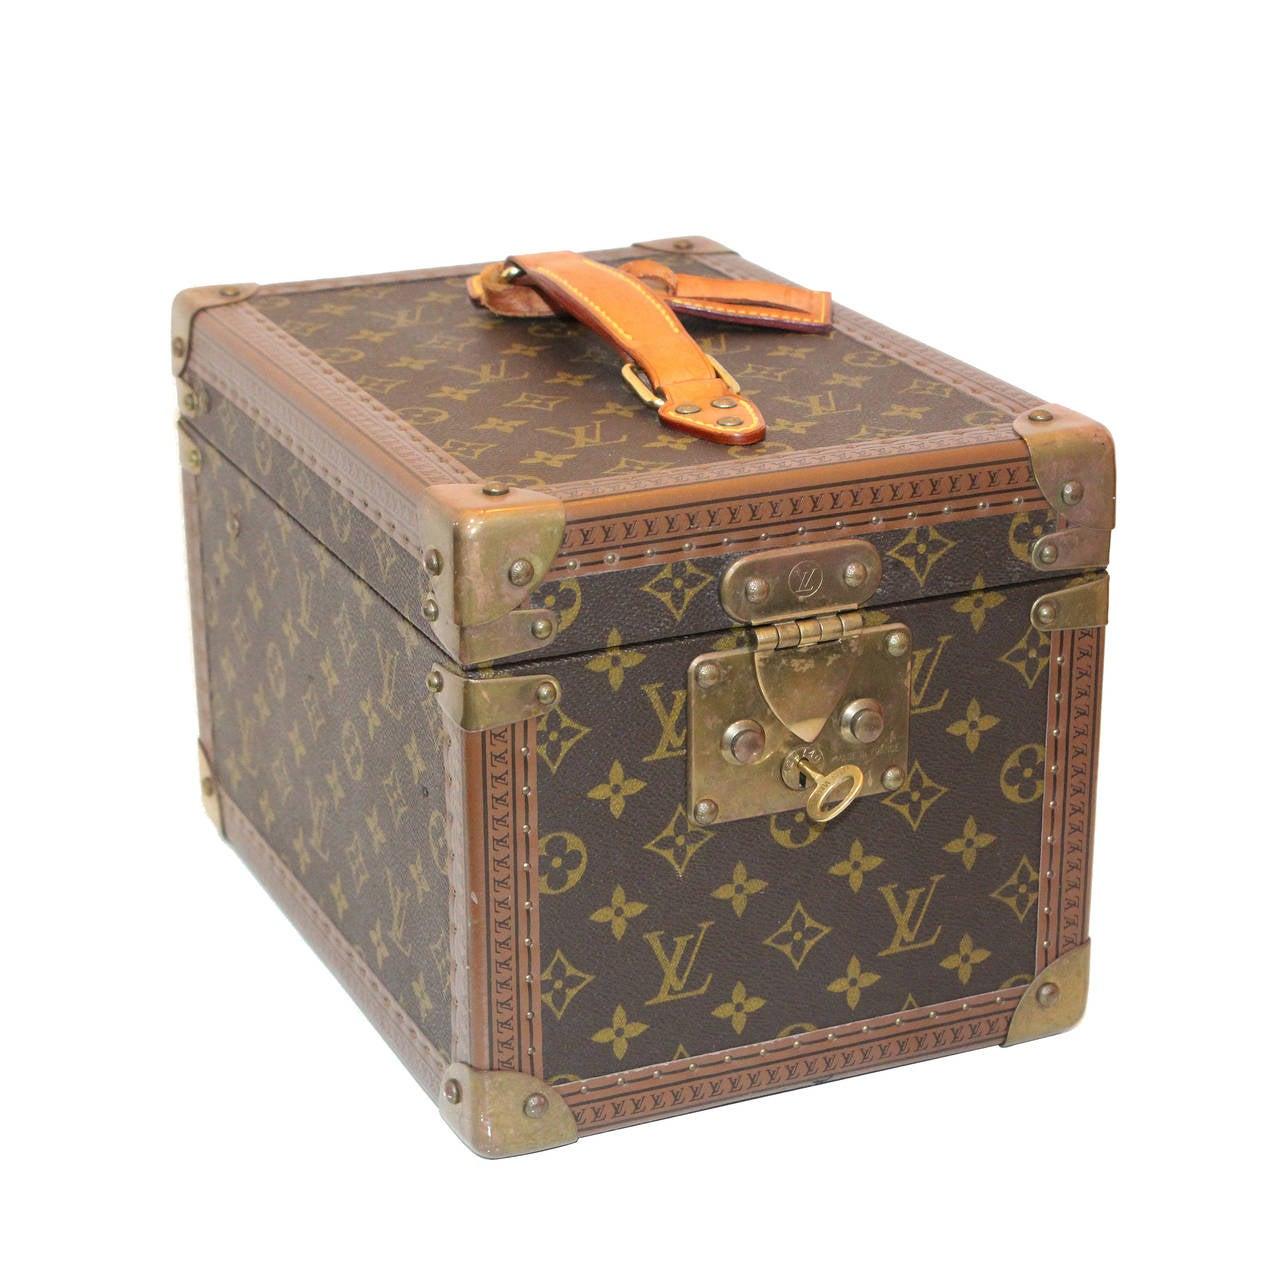 A Vintage Louis Vuitton Monogram Beauty Box at 1stdibs